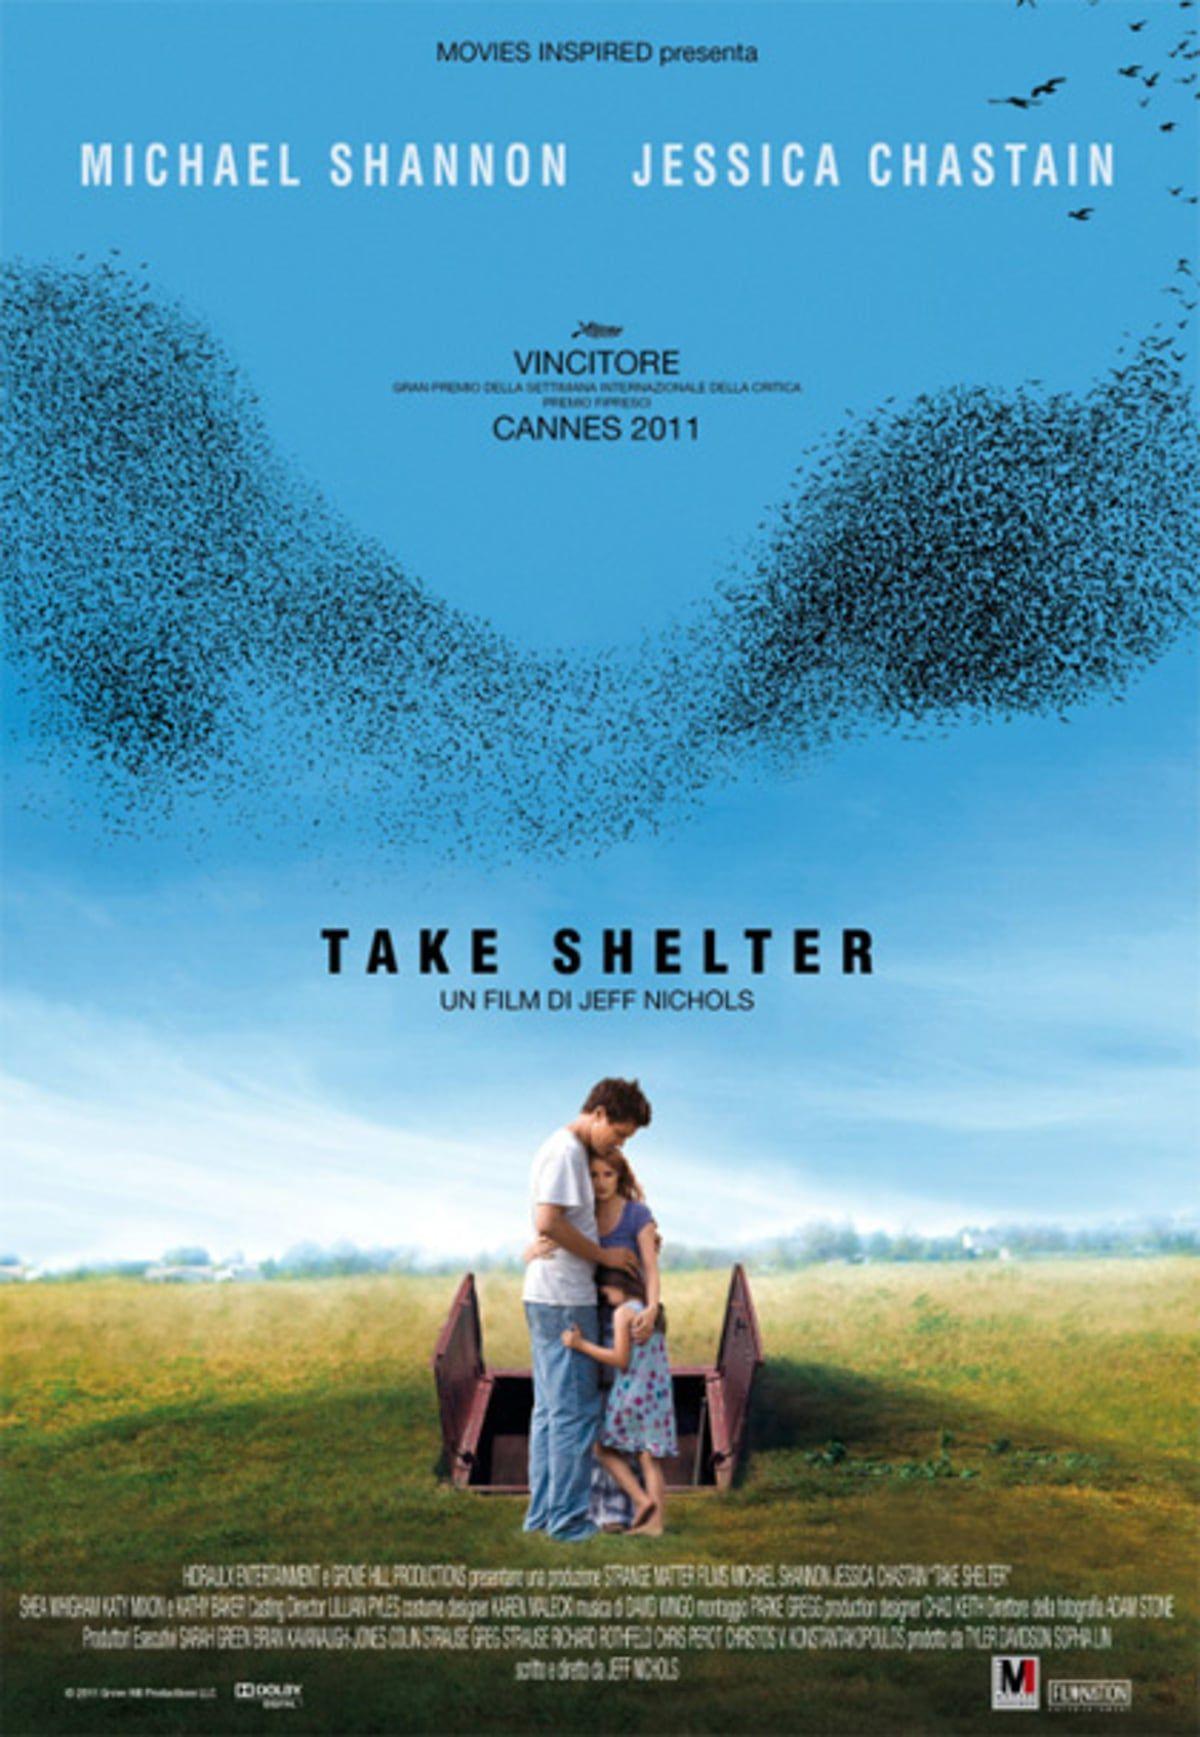 Take Shelter Pelicula Completa TakeShelter movie